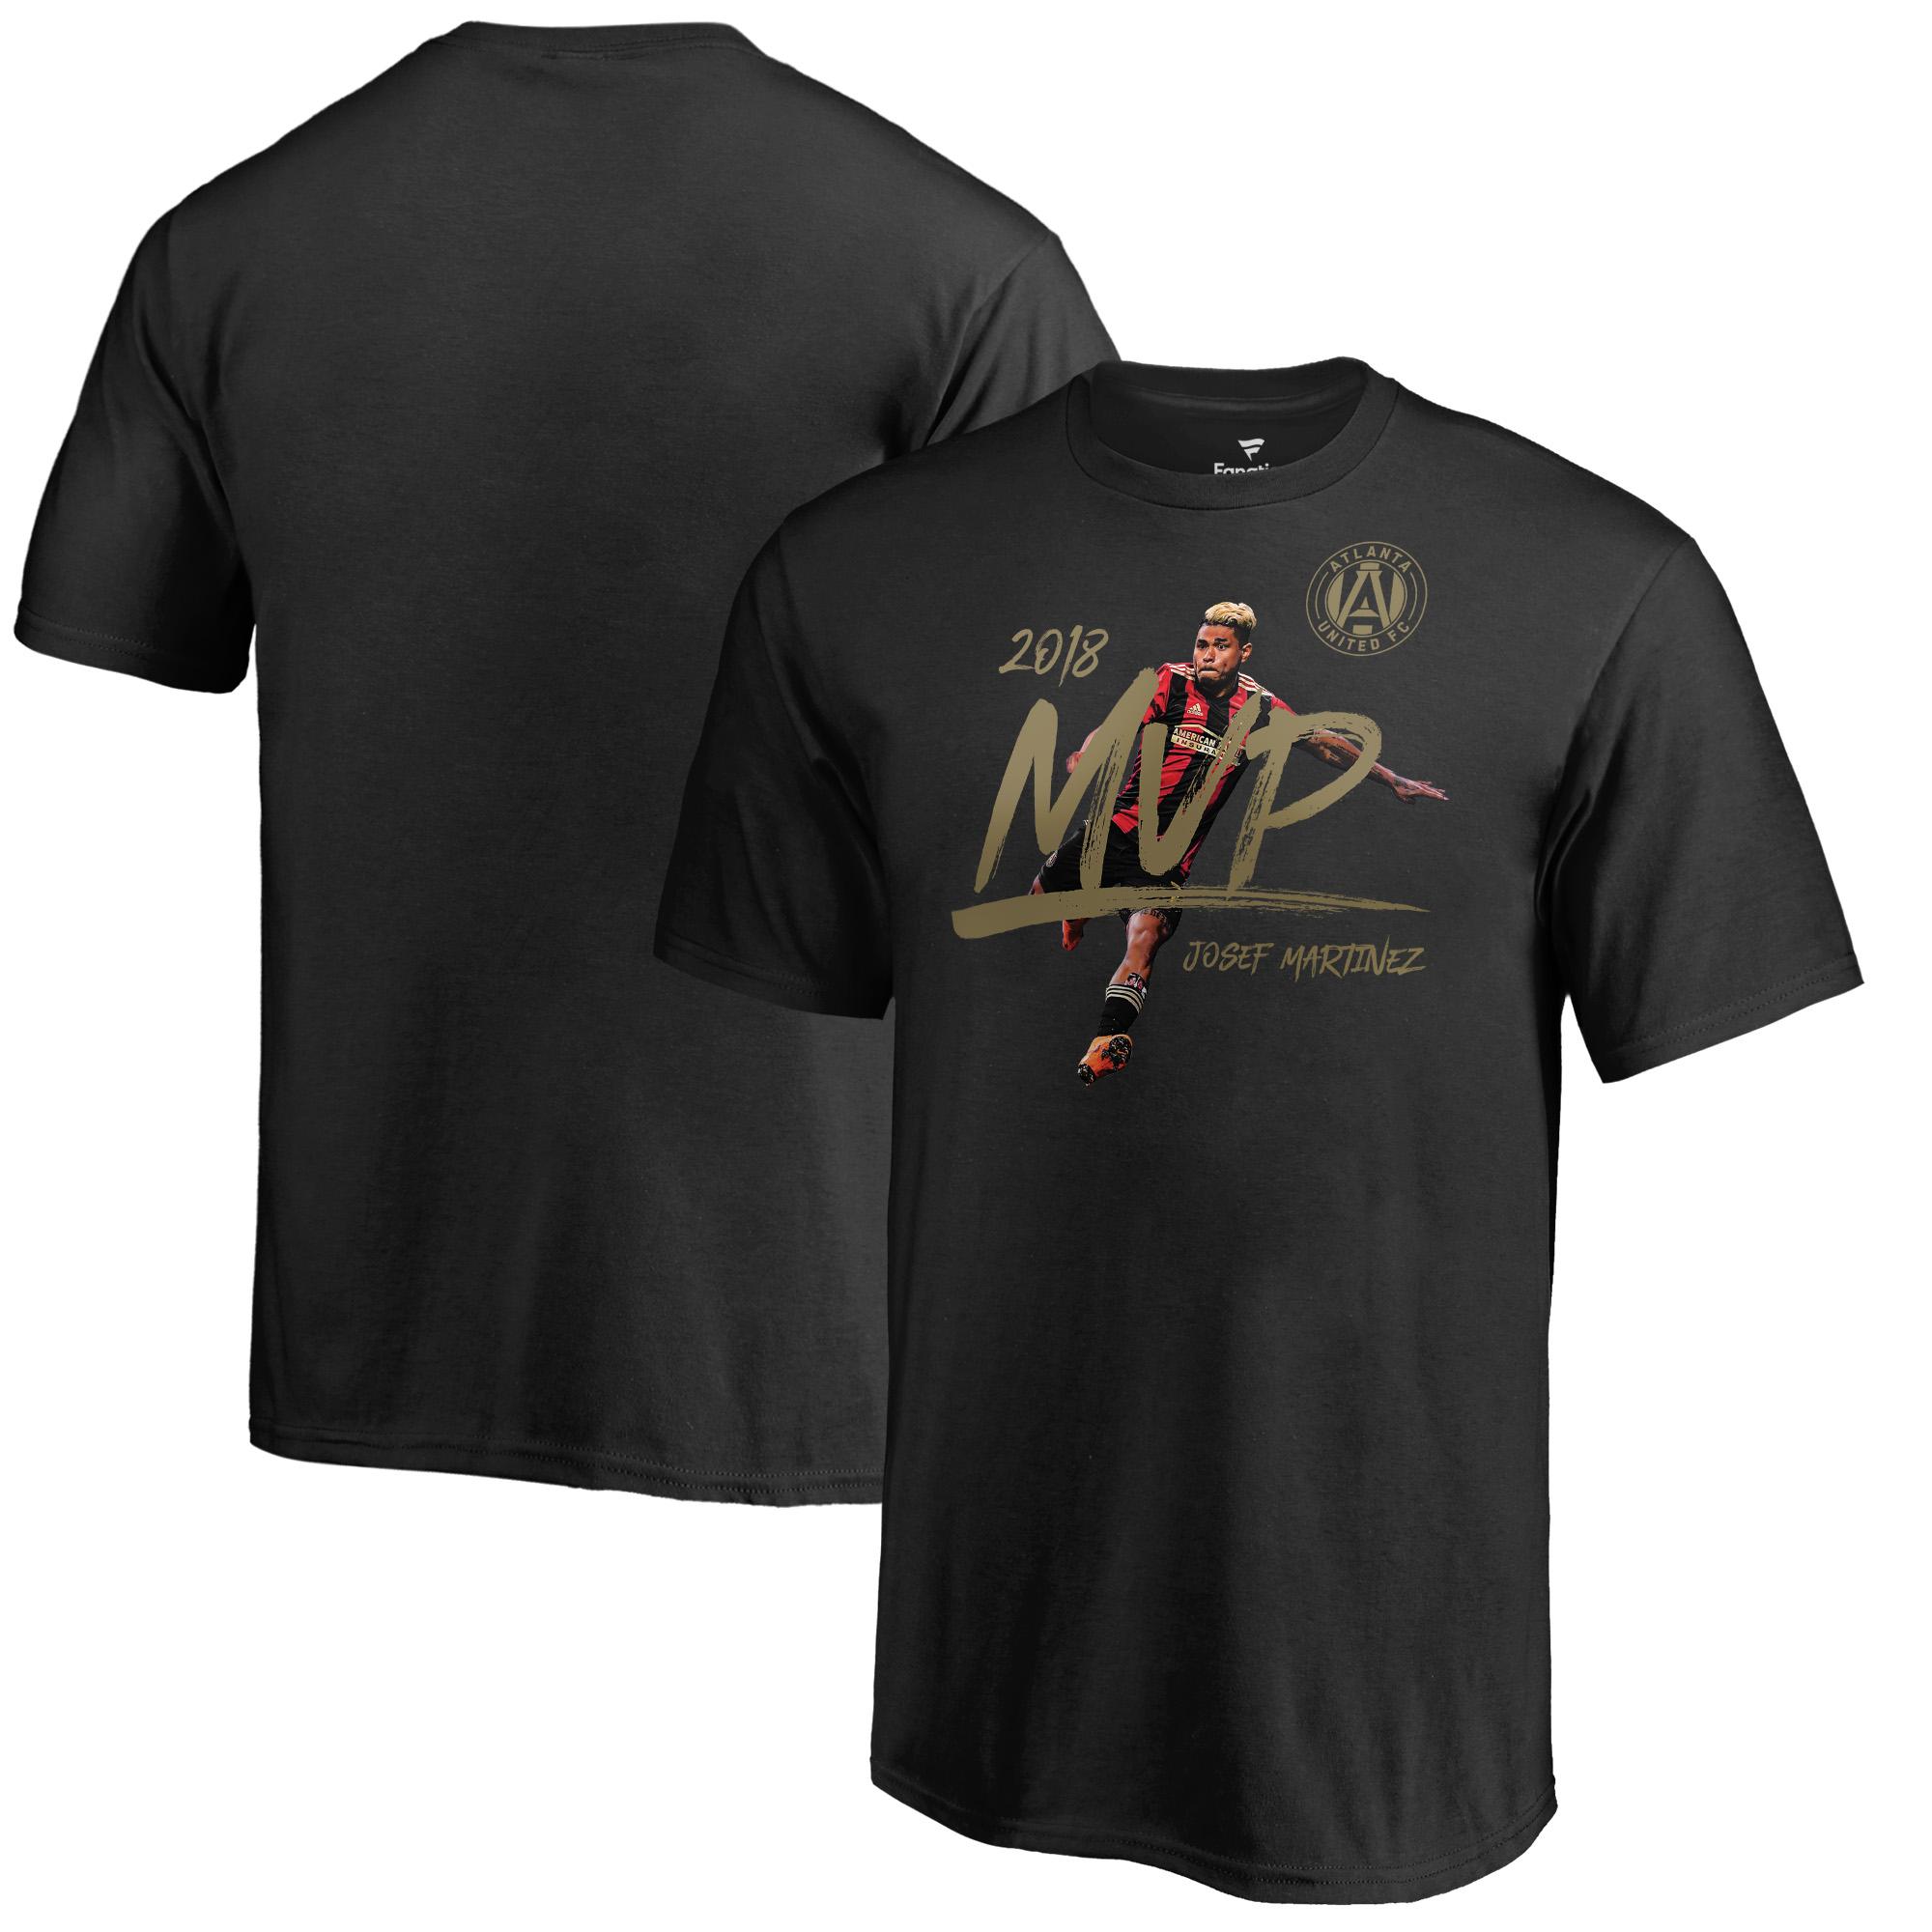 Josef Martinez Atlanta United FC Fanatics Branded Youth 2018 MLS MVP T-Shirt - Black